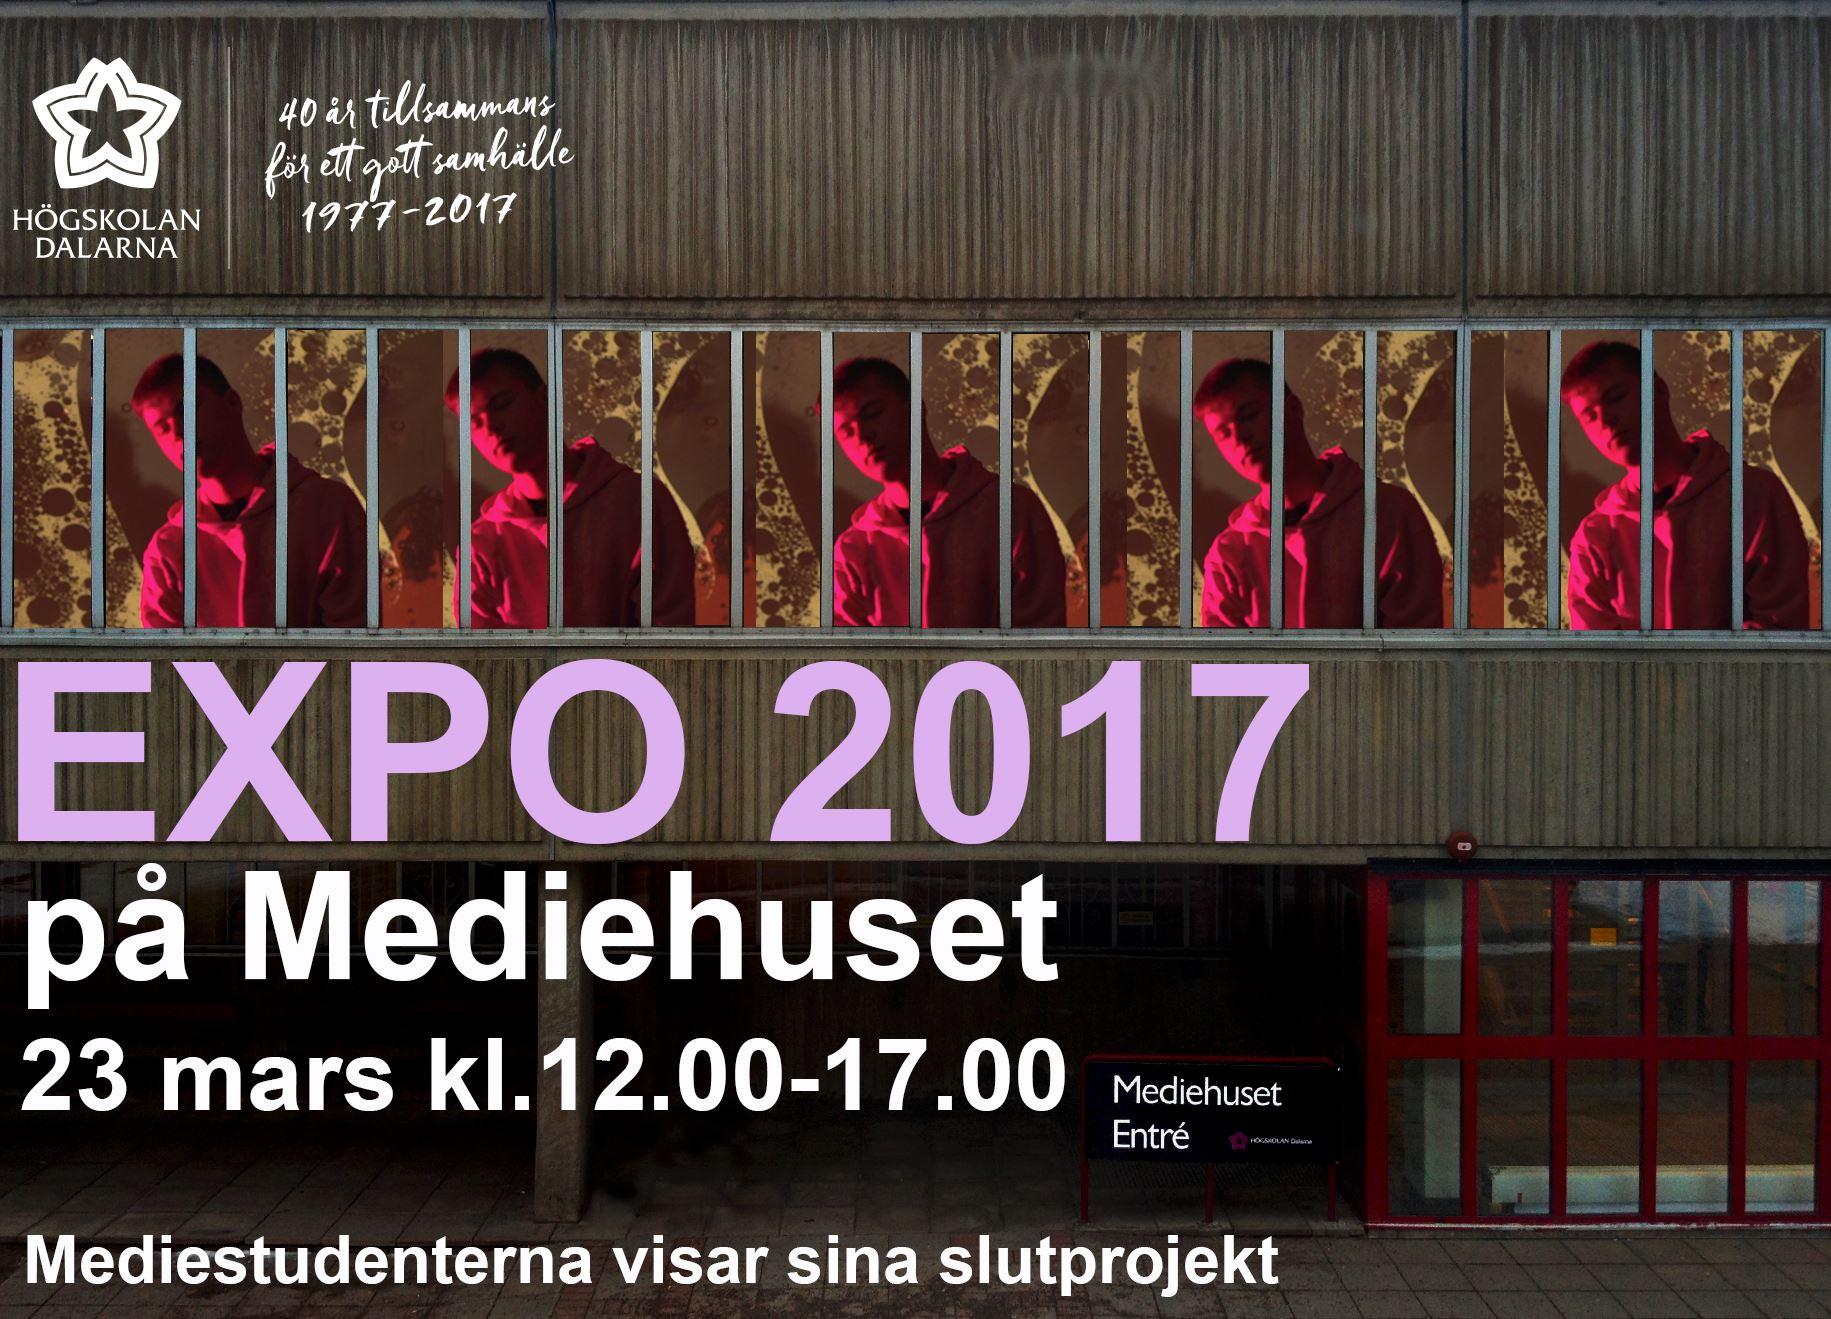 Mediestudenternas EXPO 2017